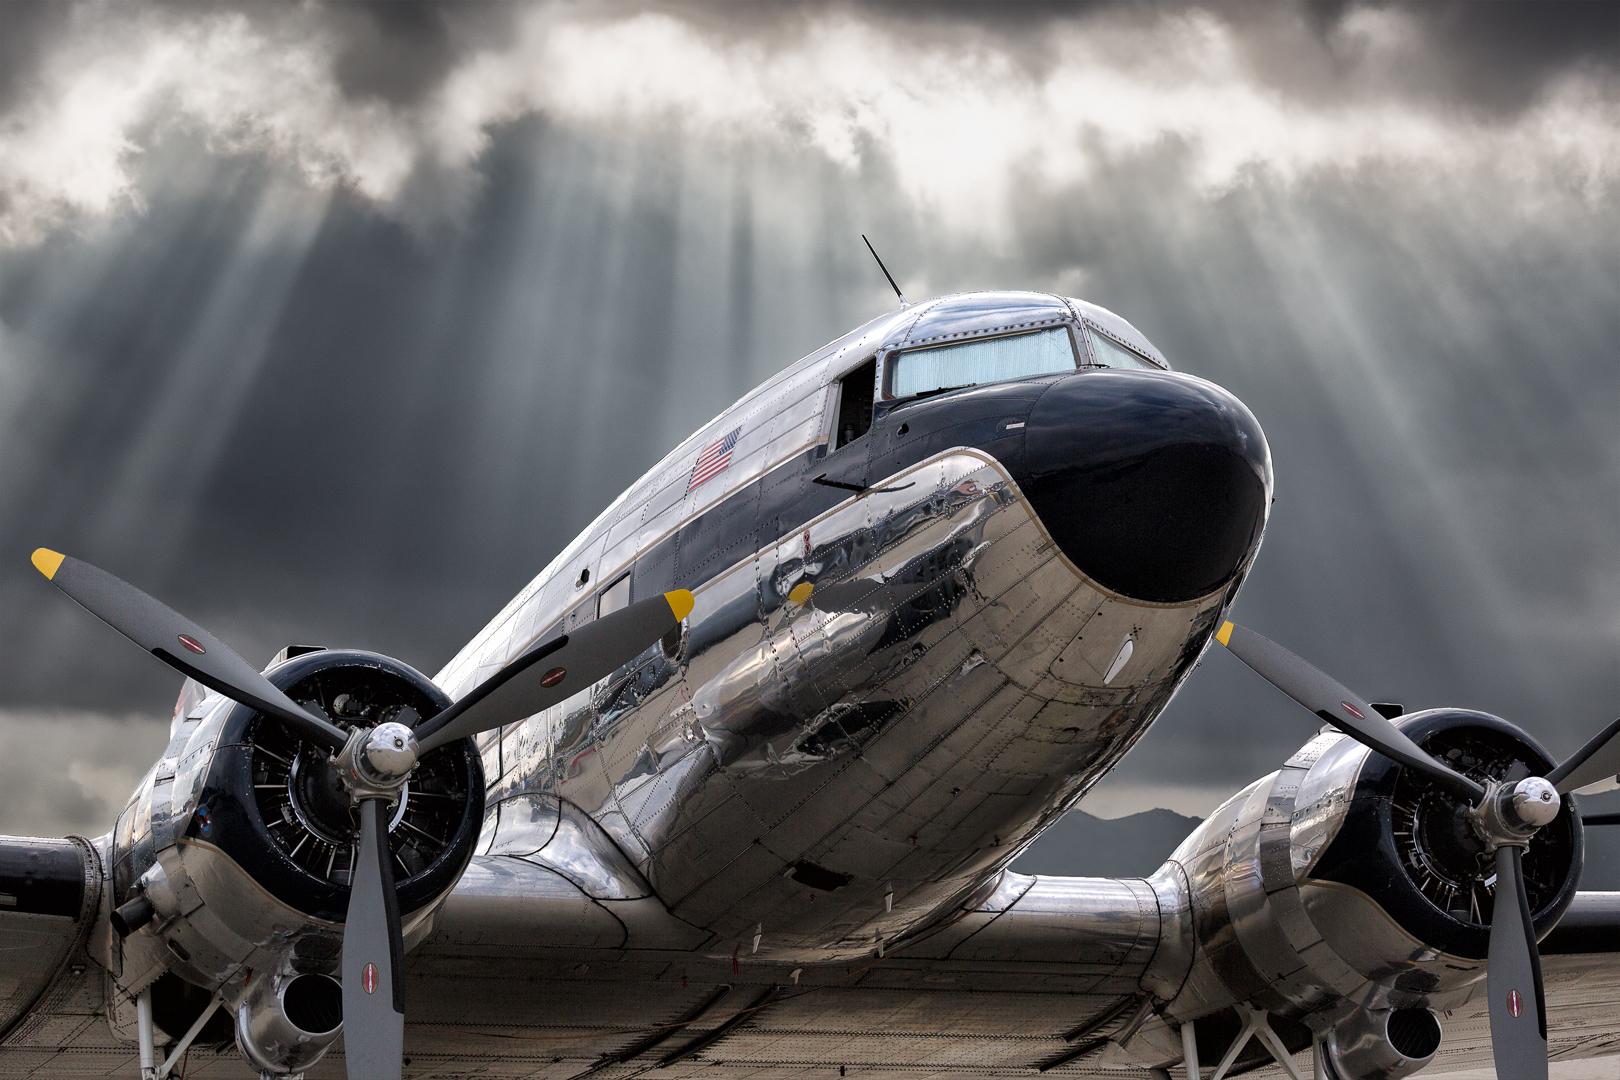 Golden Age Of Flight by Rick Gauthreaux